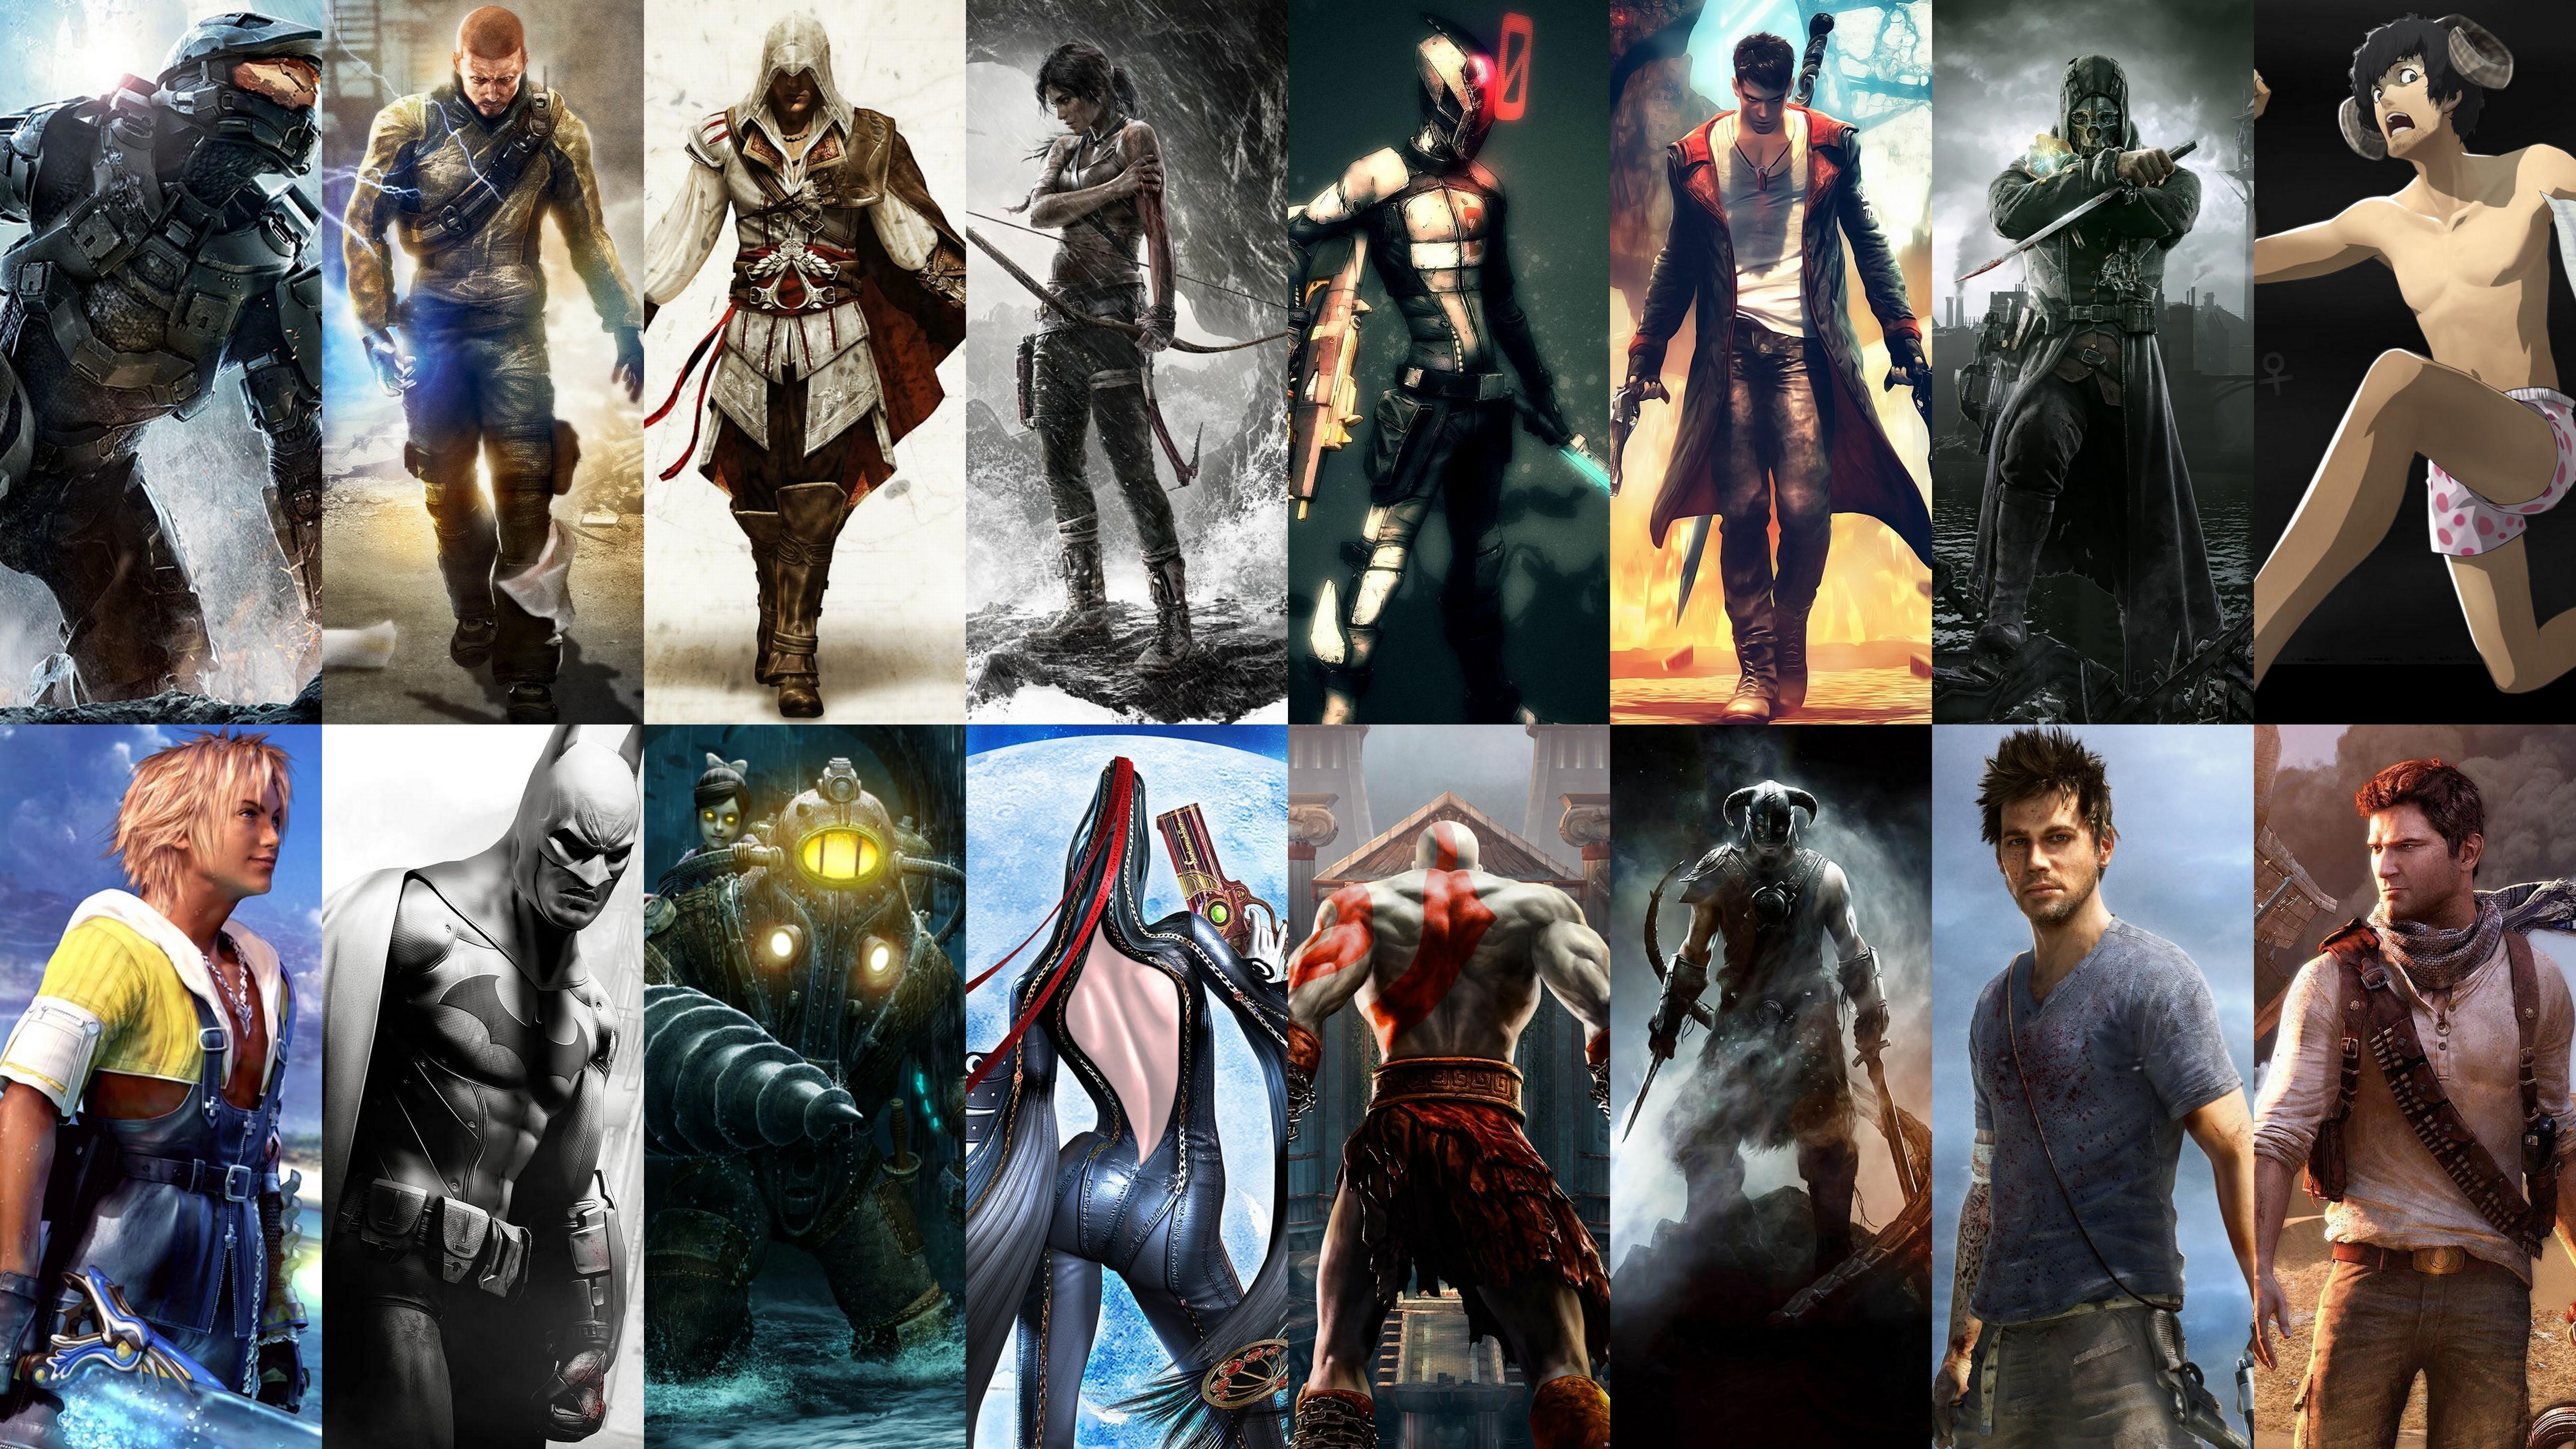 Wallpaper video games collage batman arkham city - Drake collage wallpaper ...